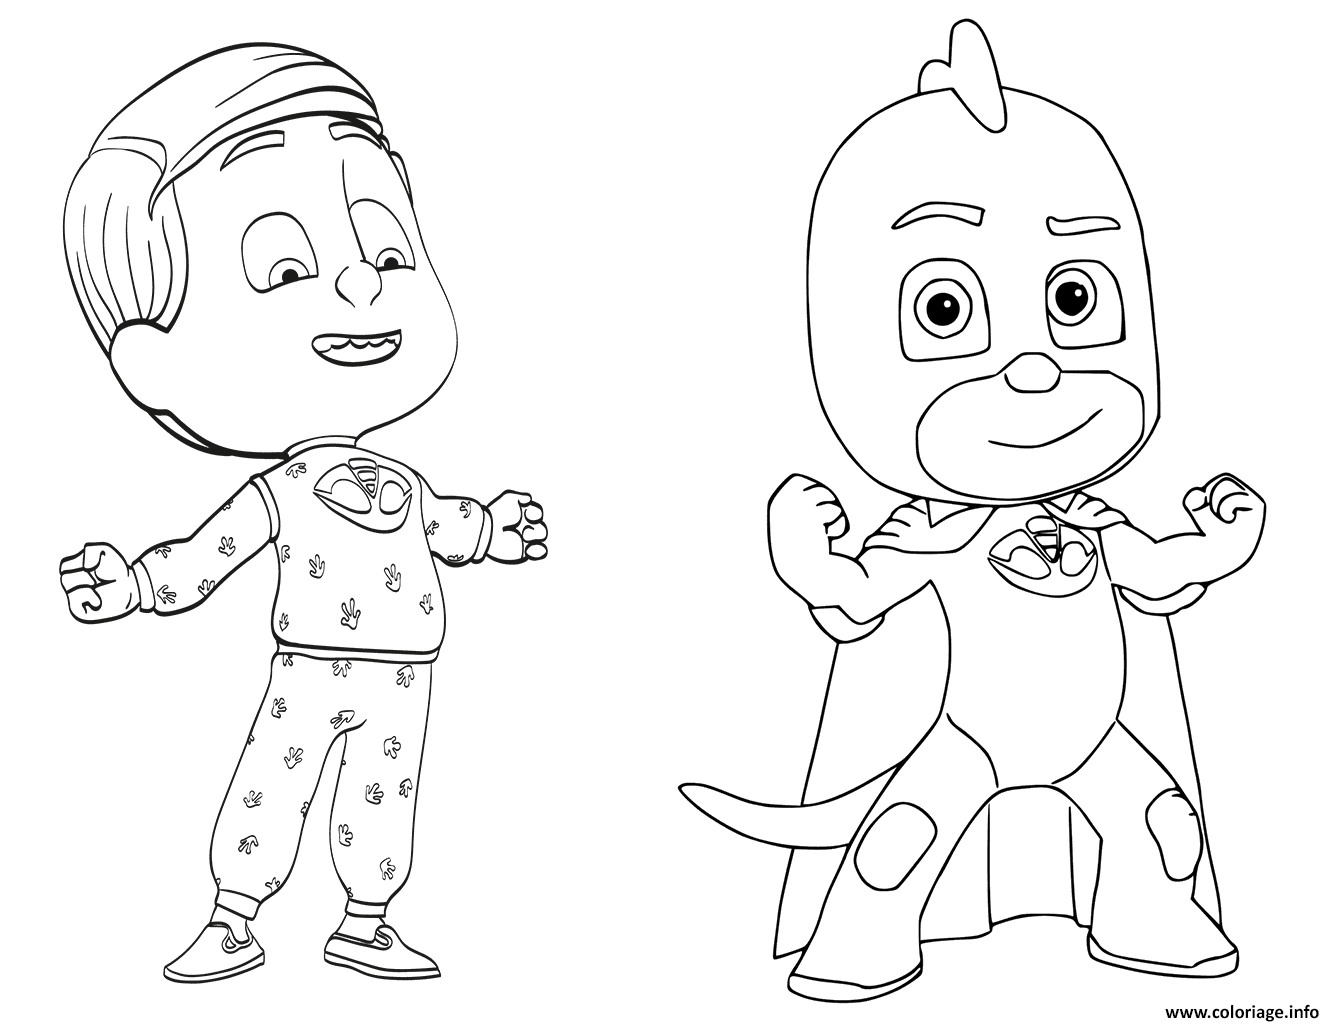 Dessin Greg est le Gluglu de Pyjamasques Coloriage Gratuit à Imprimer